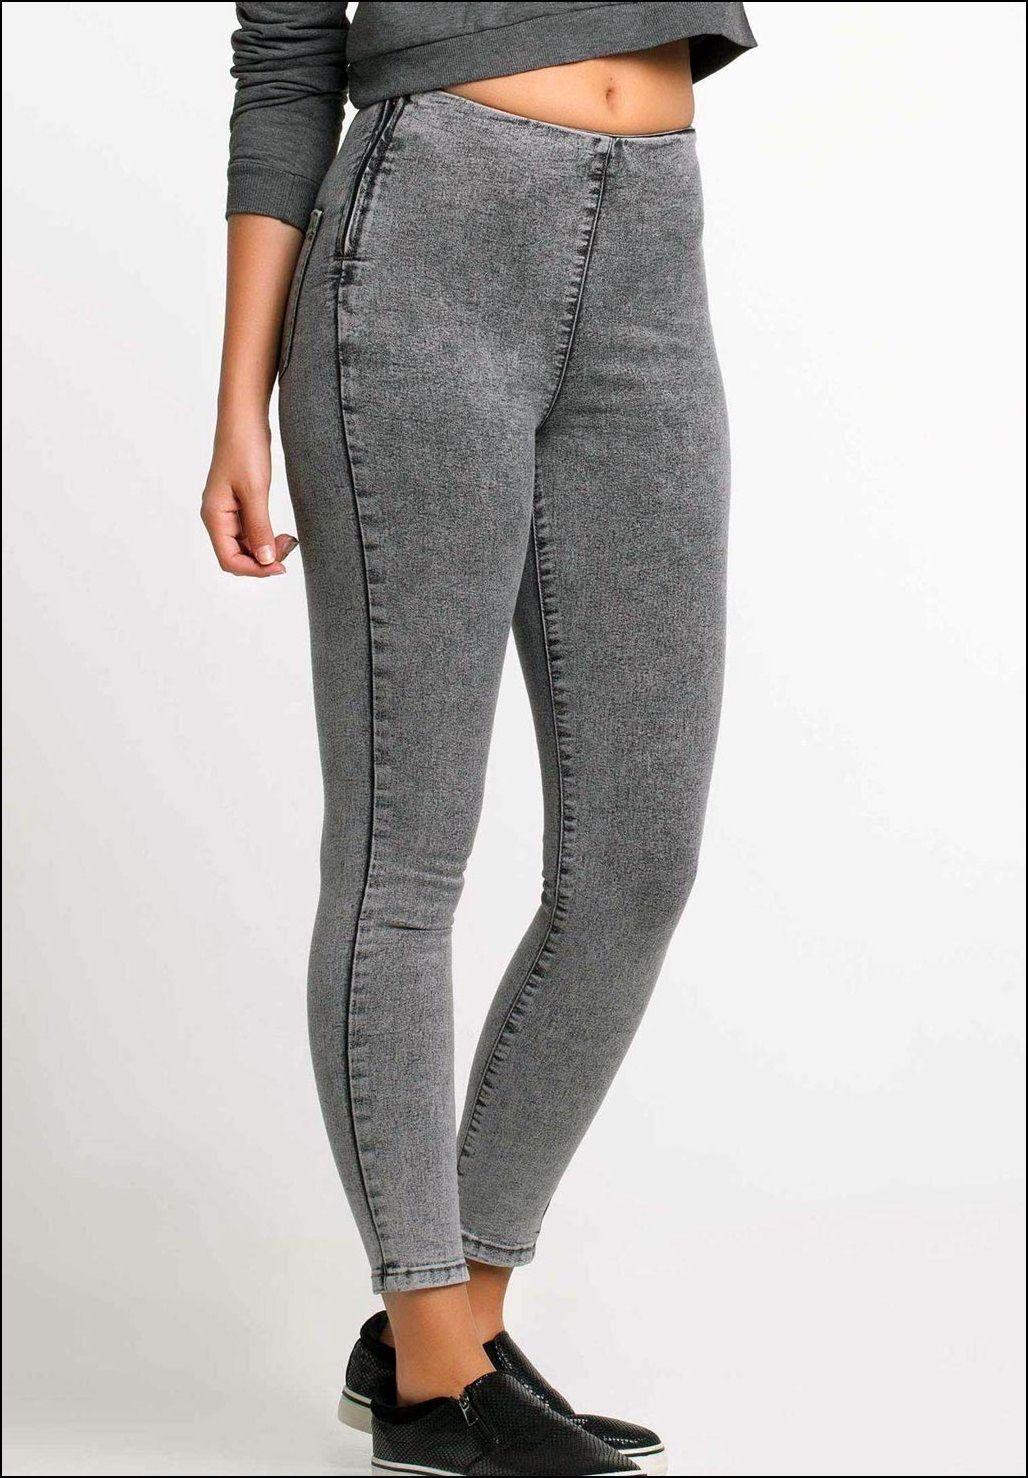 Bayan Dar Pantolon Modelleri Tarz Moda Moda Pantolon